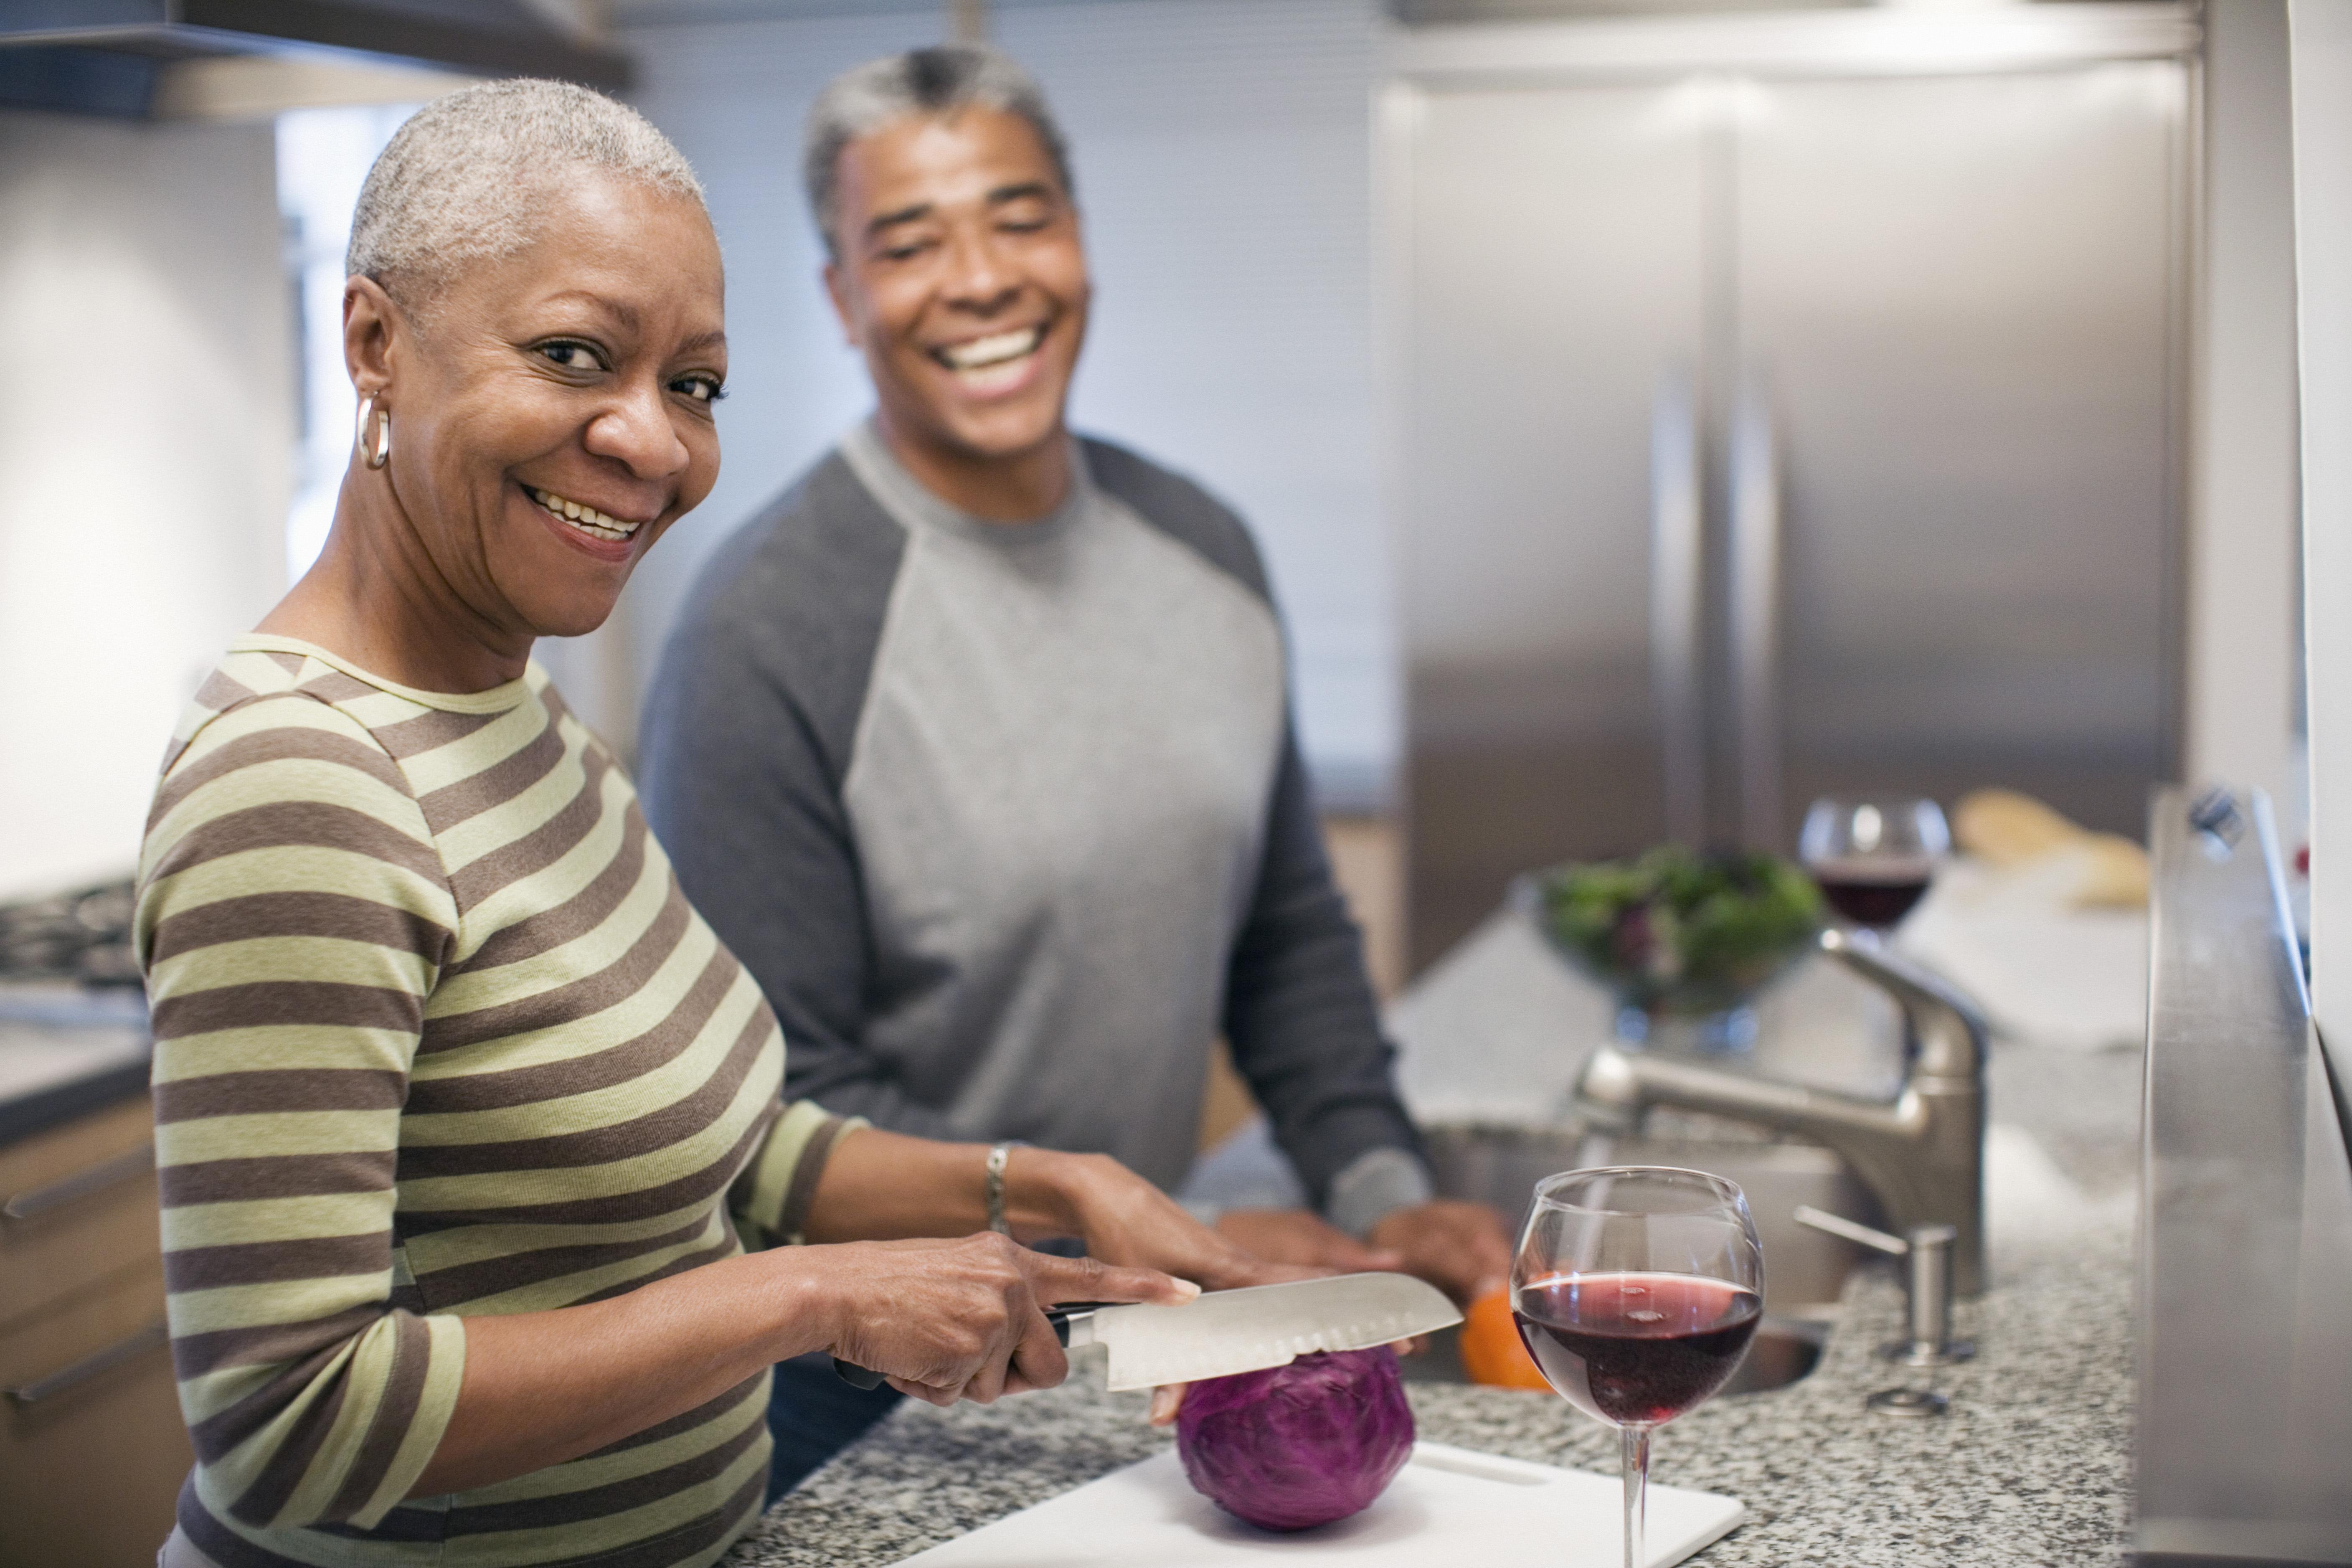 Laughing couple preparing dinner